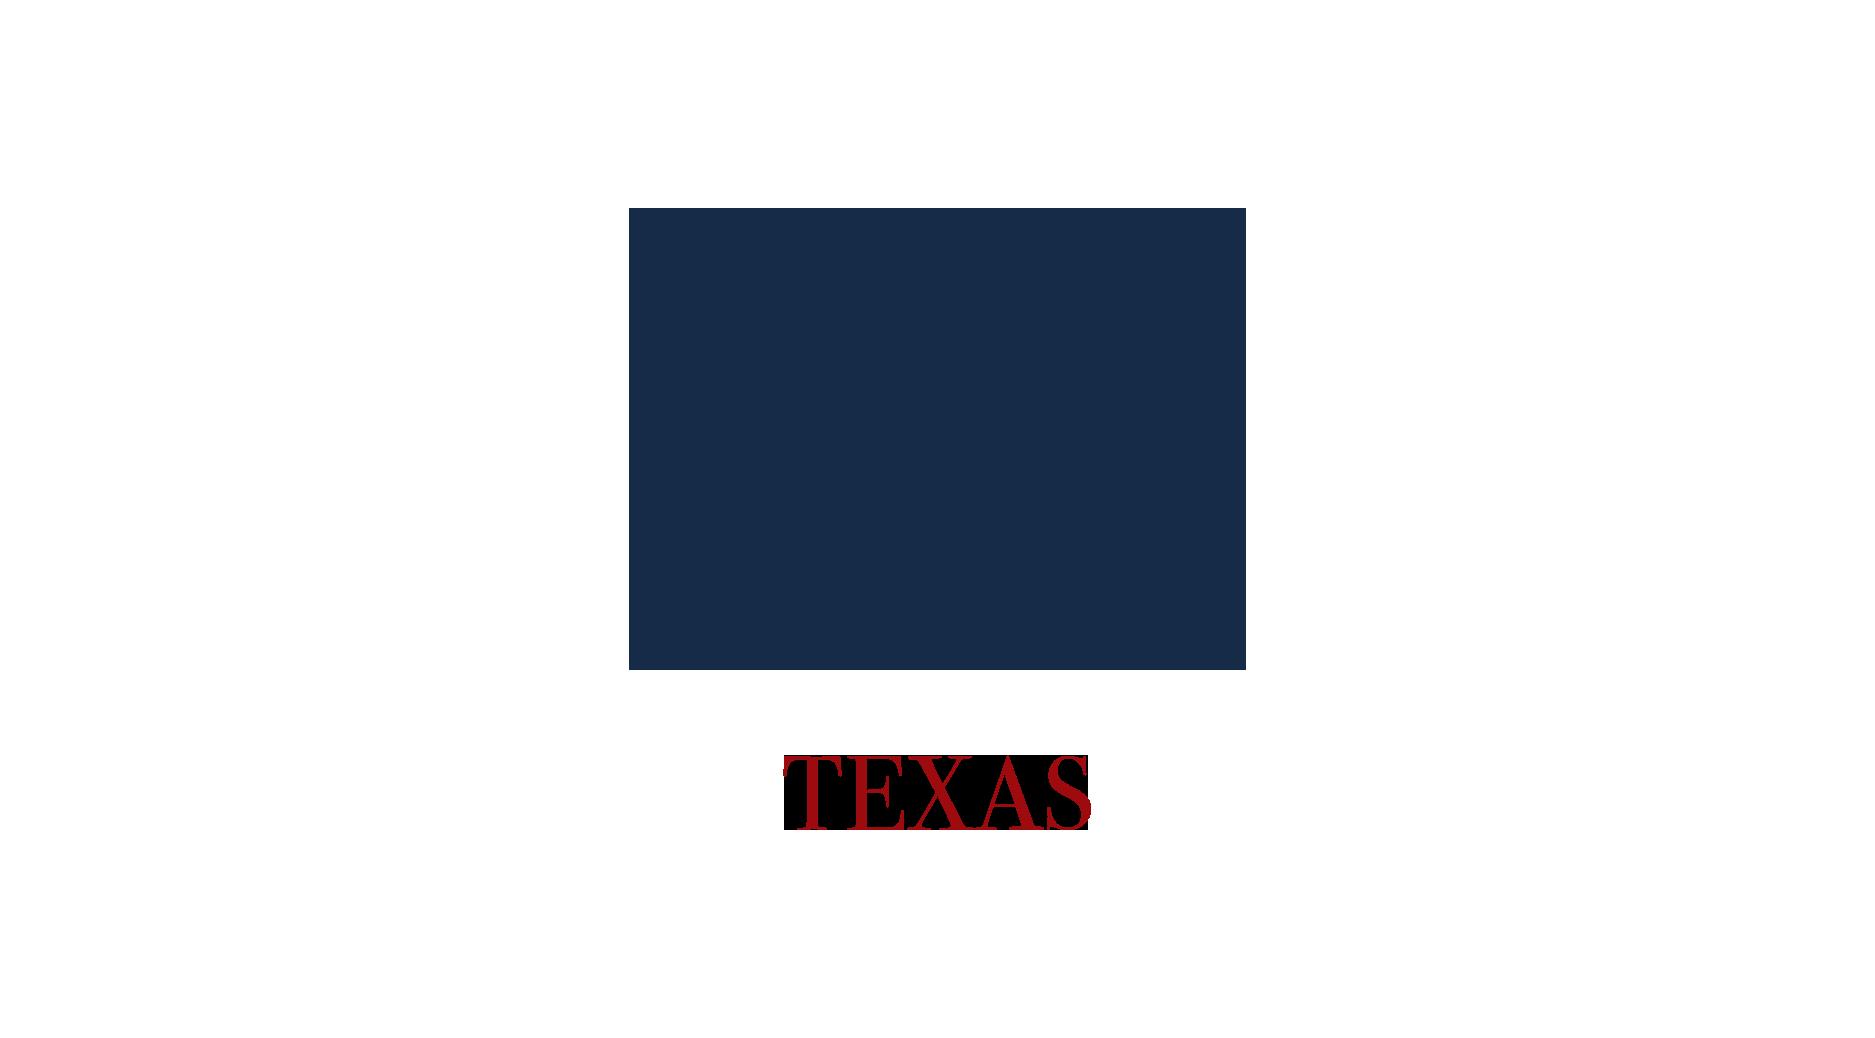 United Texas